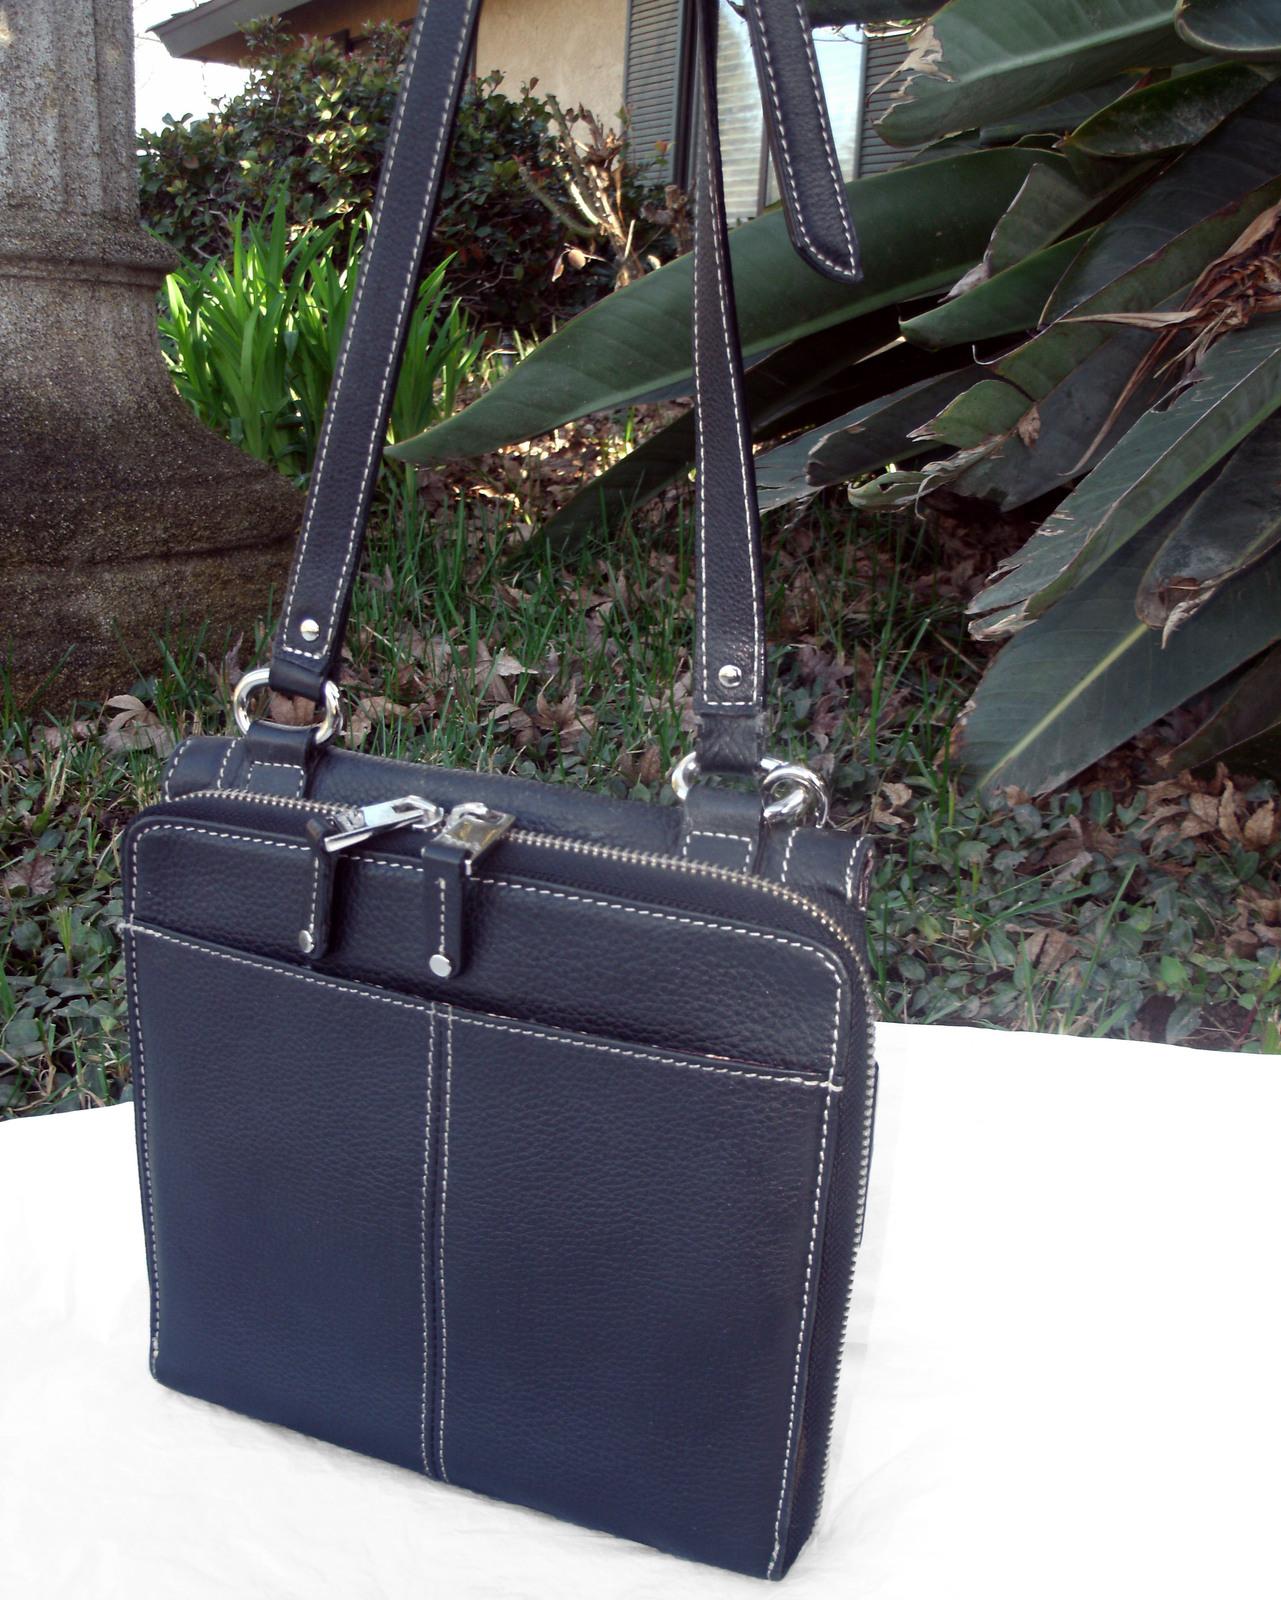 Tignanello Black Pebbled Leather Organizer Crossbody built in Wallet image 8